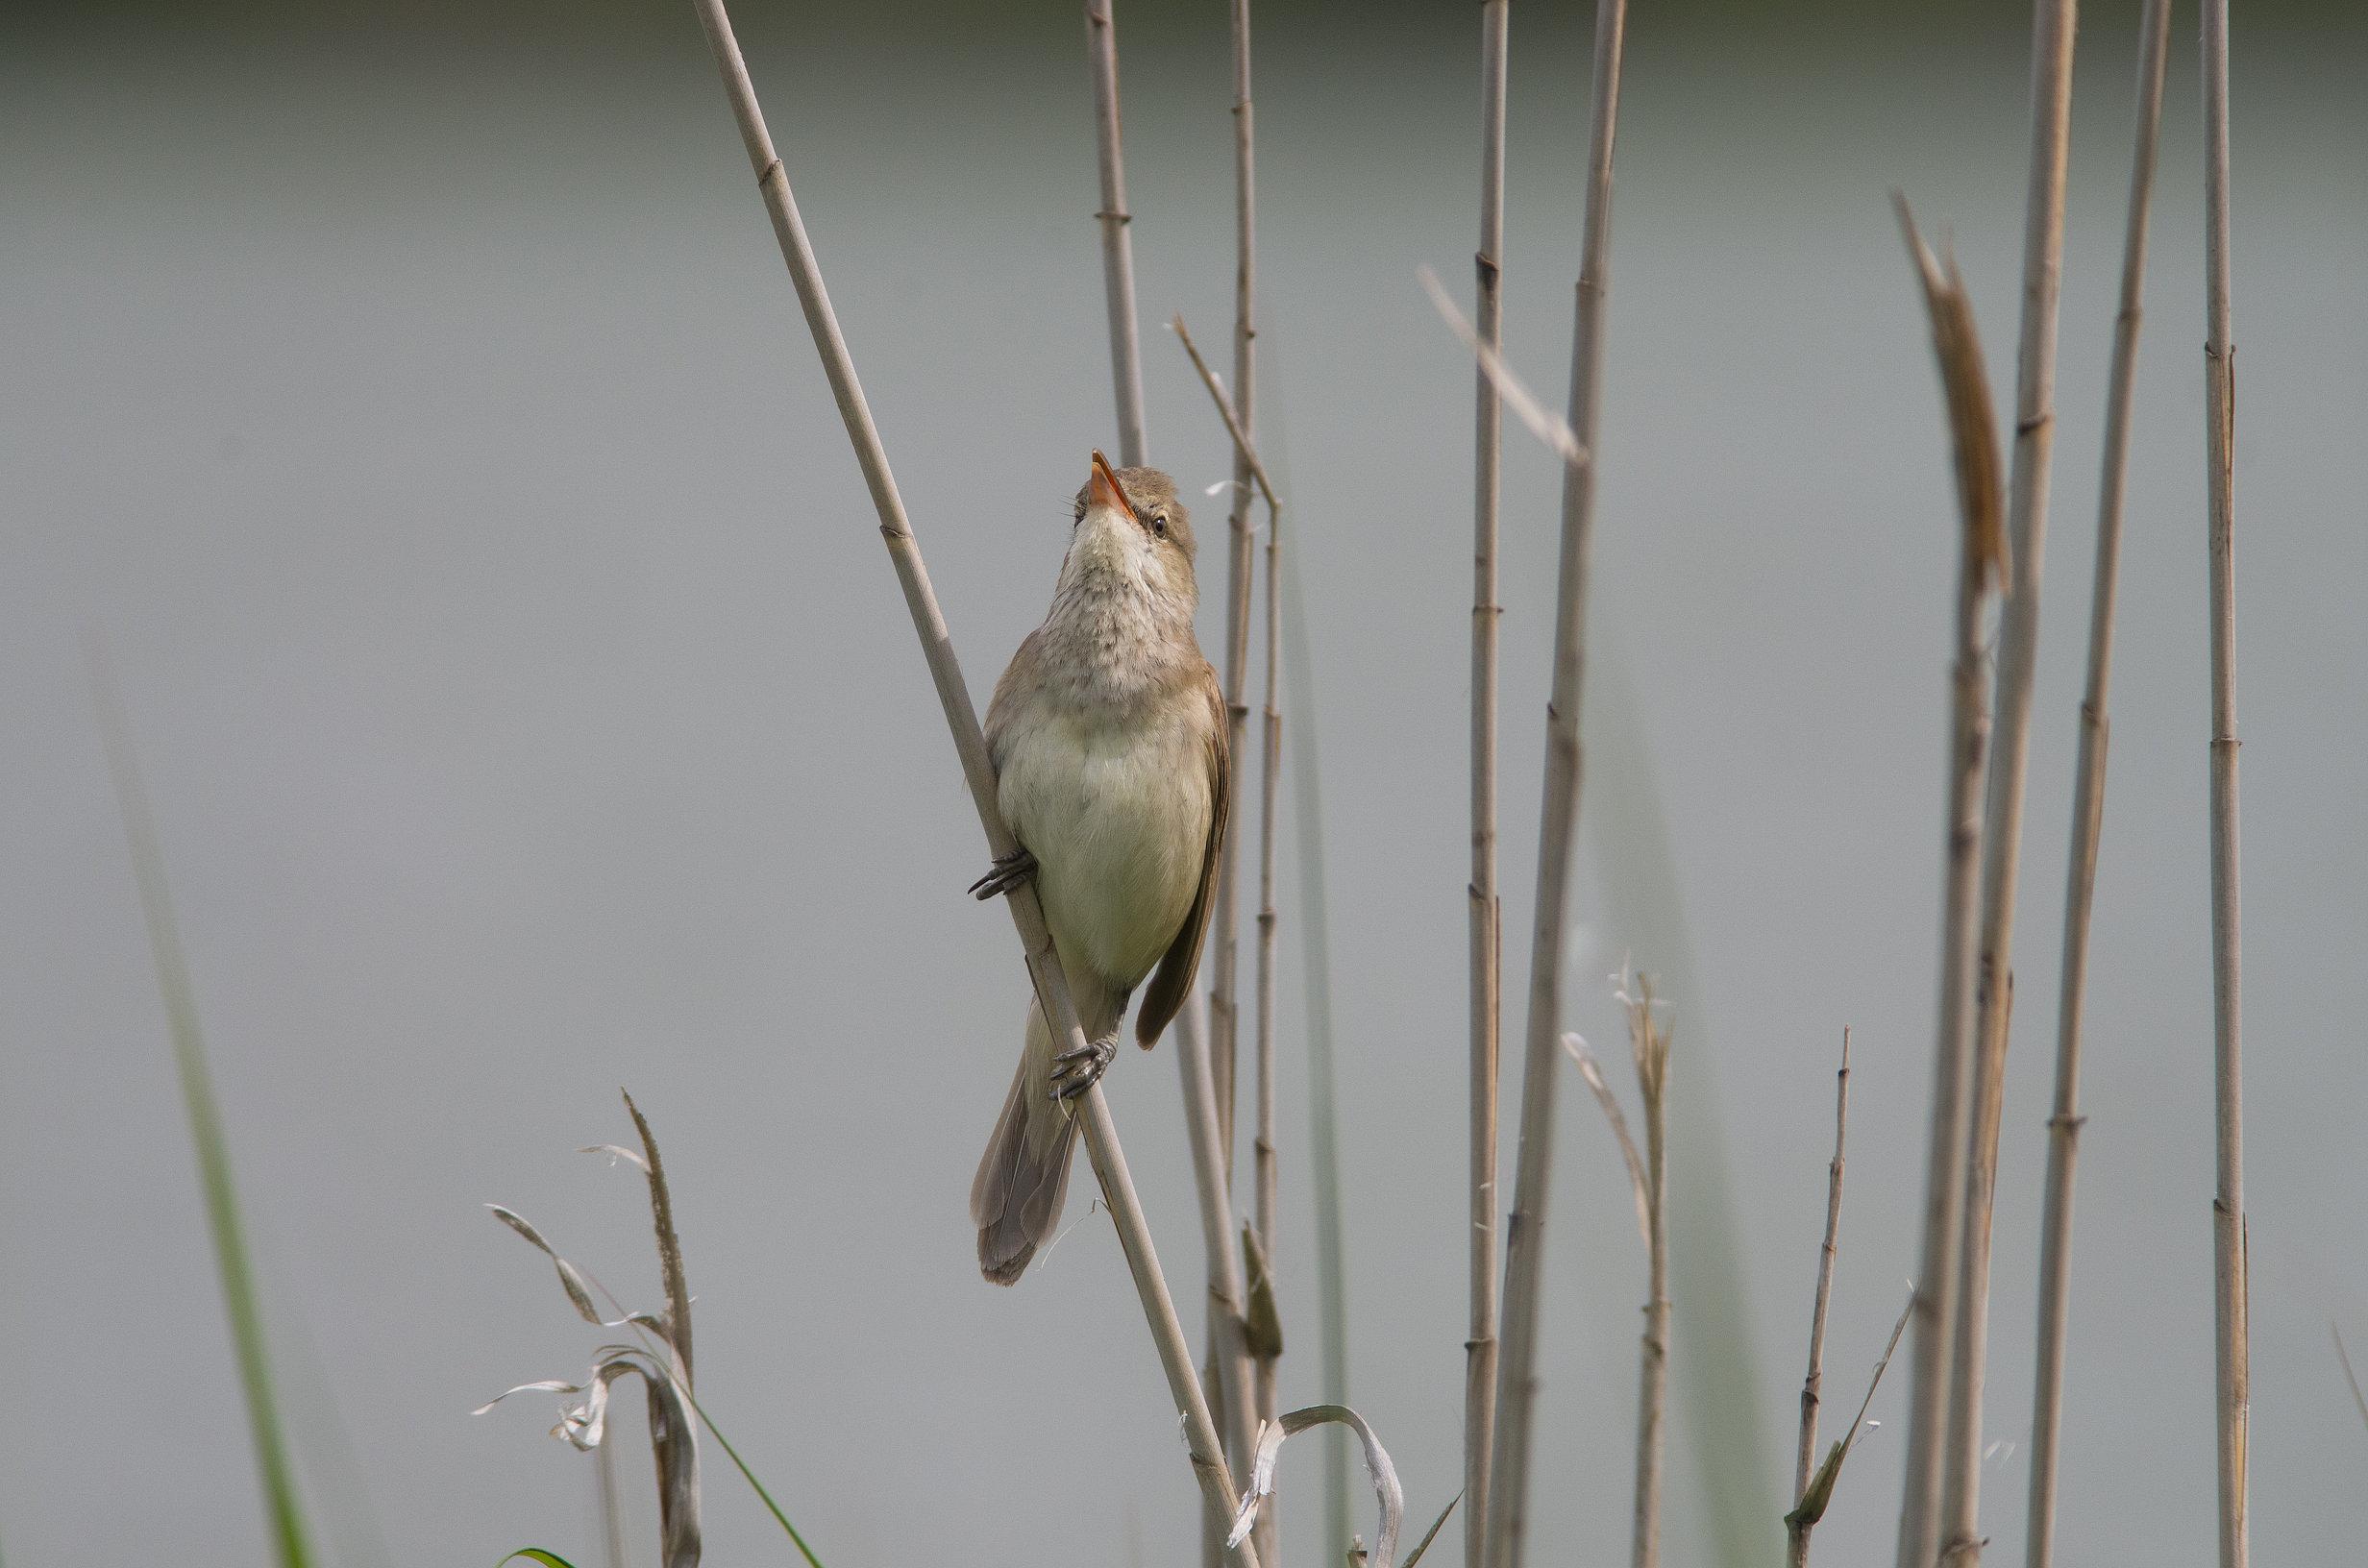 AFボーグ BORG71FLで撮影した野鳥・オオヨシキリの写真画像